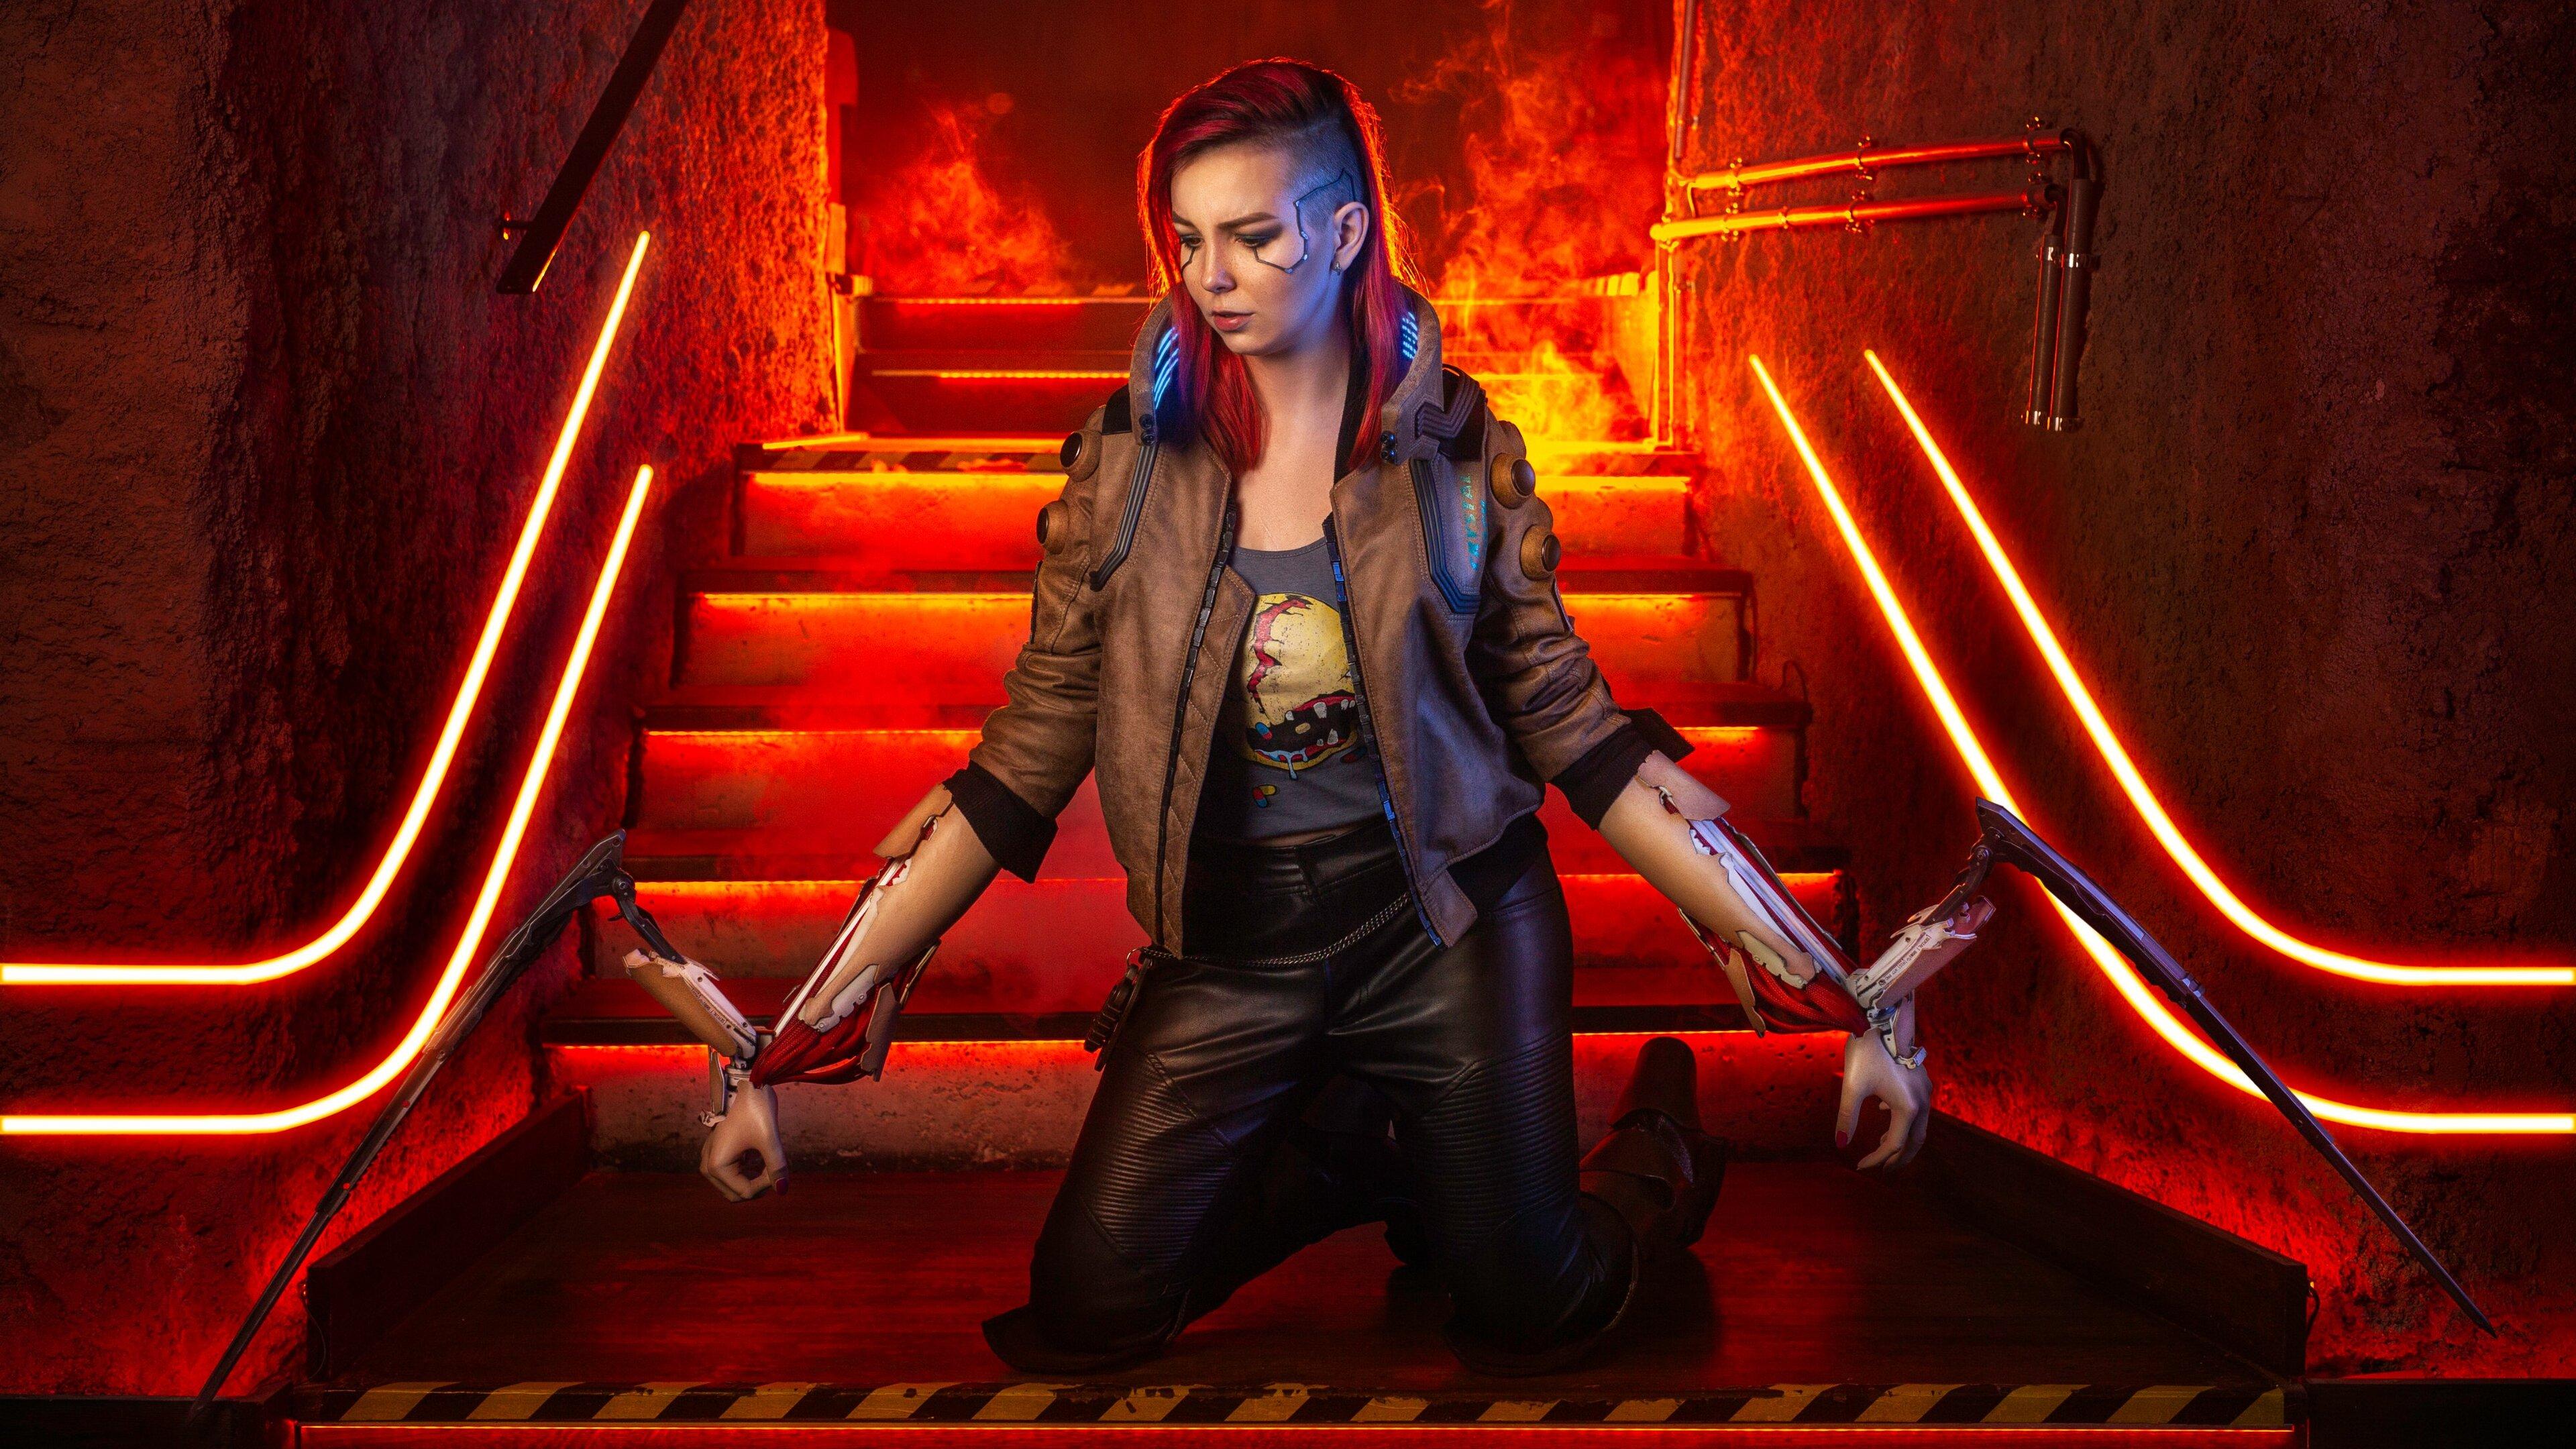 v-in-cyberpunk-2077-cosplay-p4.jpg